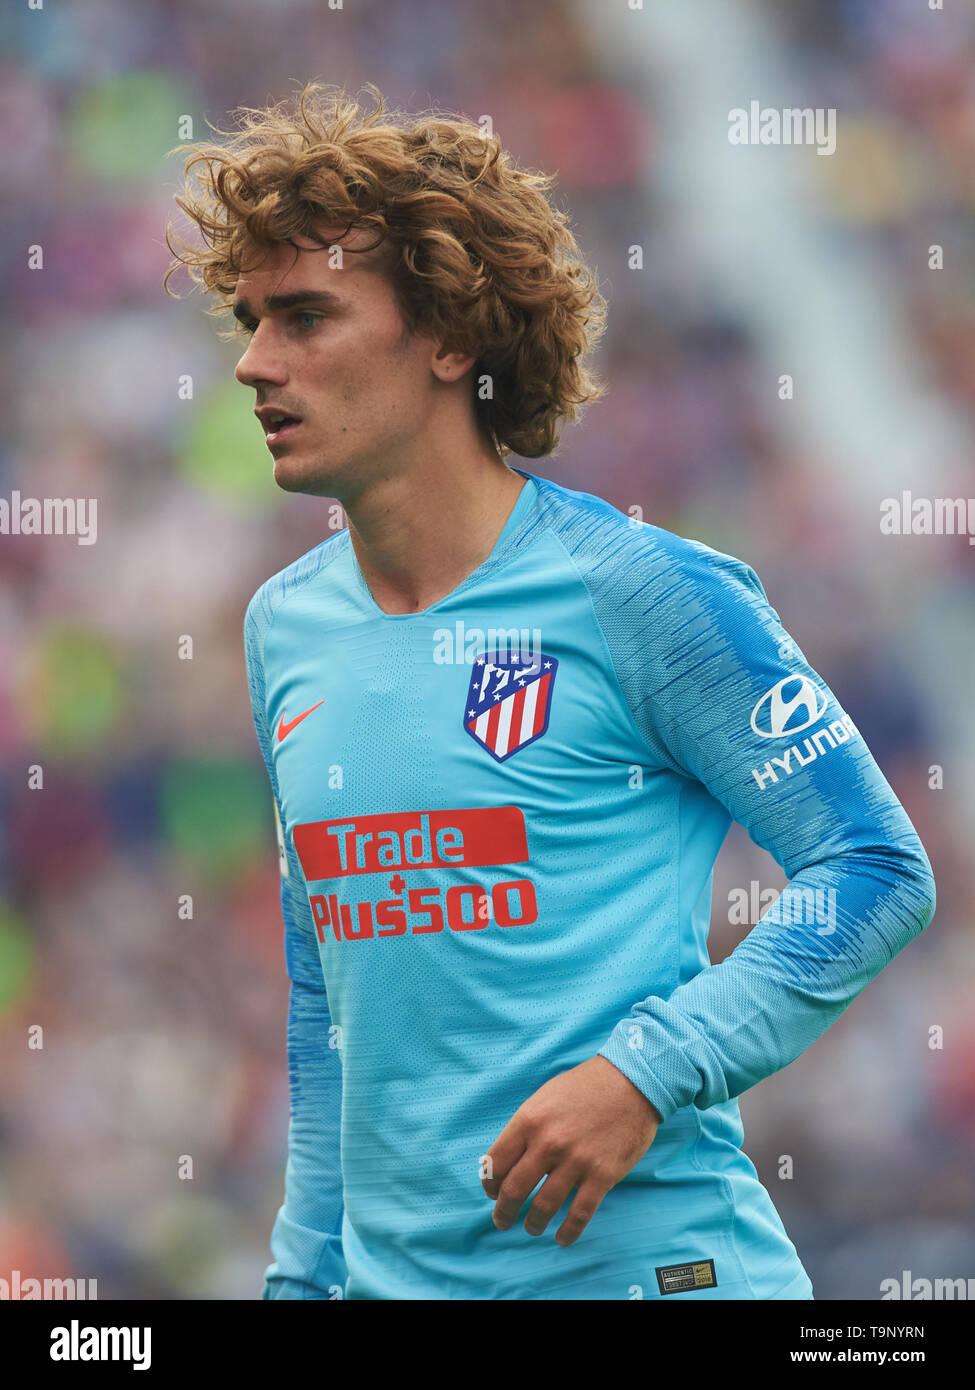 a9e055456 Antoine Griezmann 2018 Atletico Madrid Stock Photos   Antoine ...